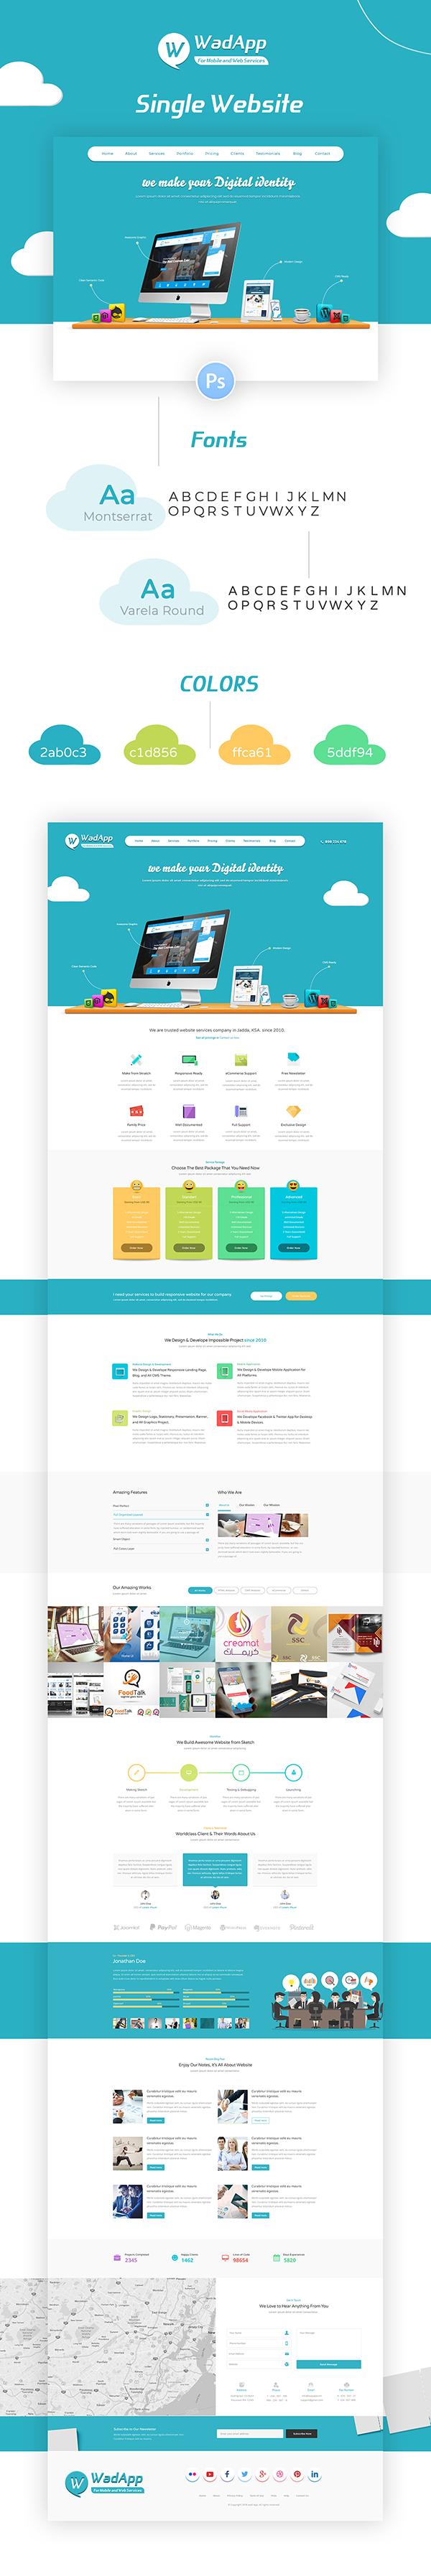 Company Profile Website Landing Page Profile Website Website Fonts Website Template Design